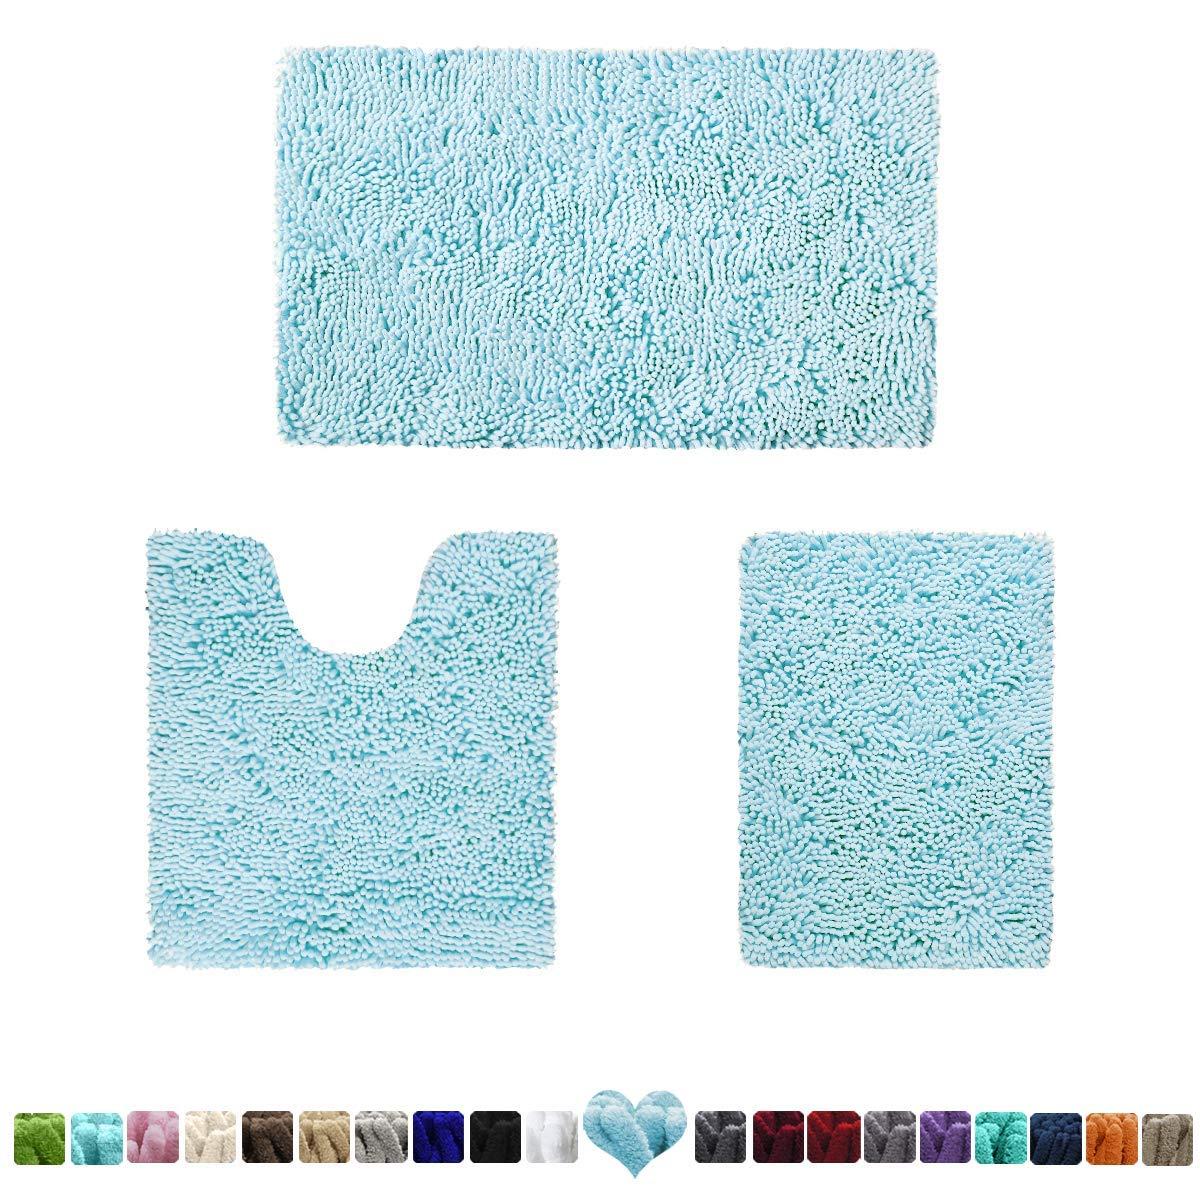 HOMEIDEAS 3 Pieces Bathroom Rugs Set Baby Blue, Luxury Soft Chenille Bath Mats Set, Absorbent Shaggy Bath Rugs & Slip Resistant Plush Carpets Mats for Tub, Shower, Bathroom